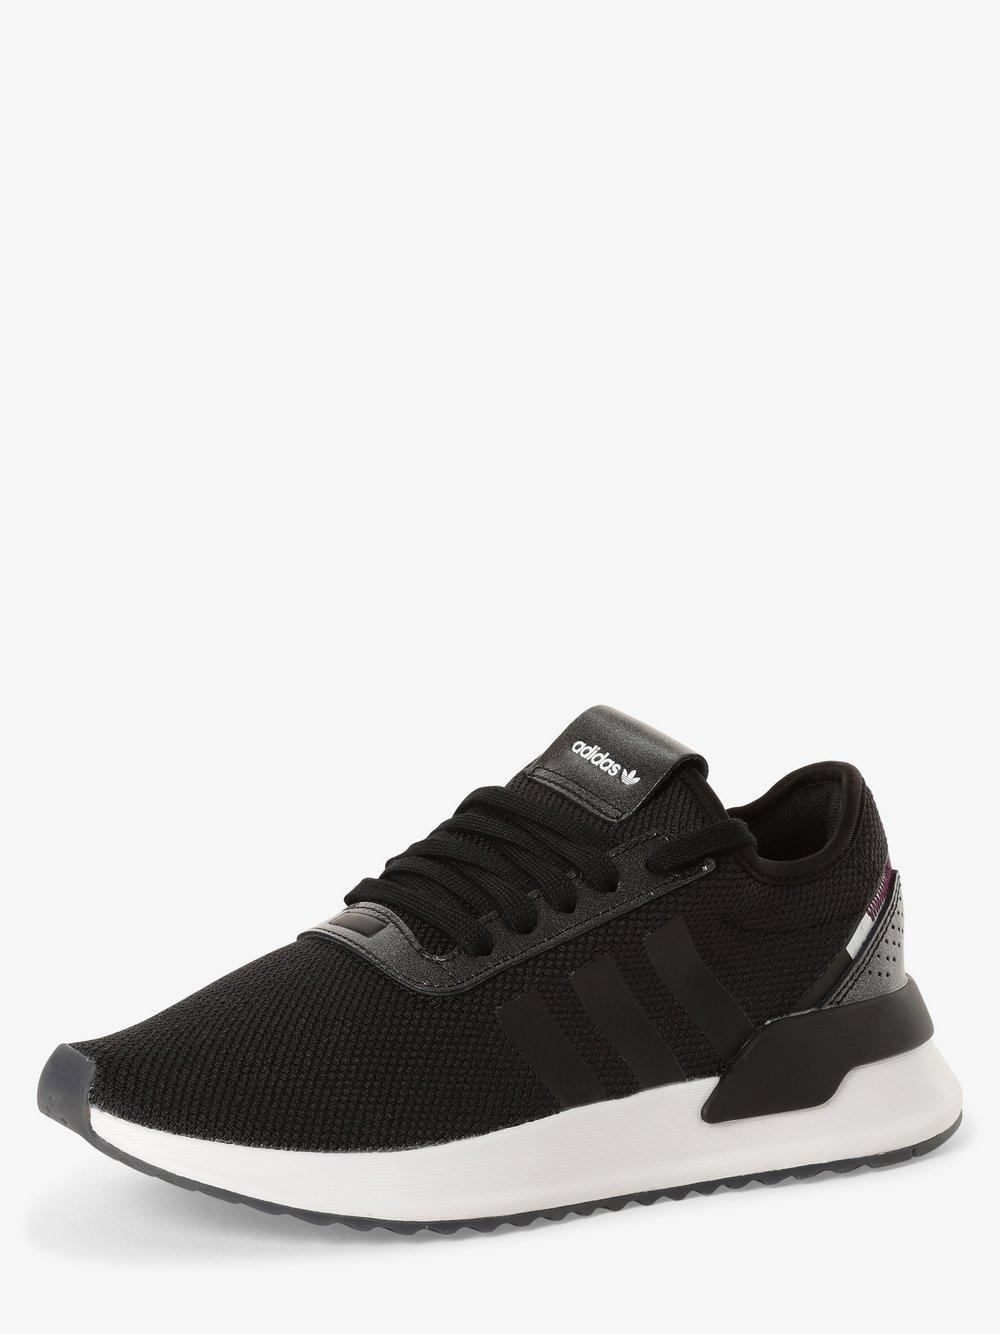 adidas Originals - Tenisówki damskie – ADIDAS UK DOB, czarny